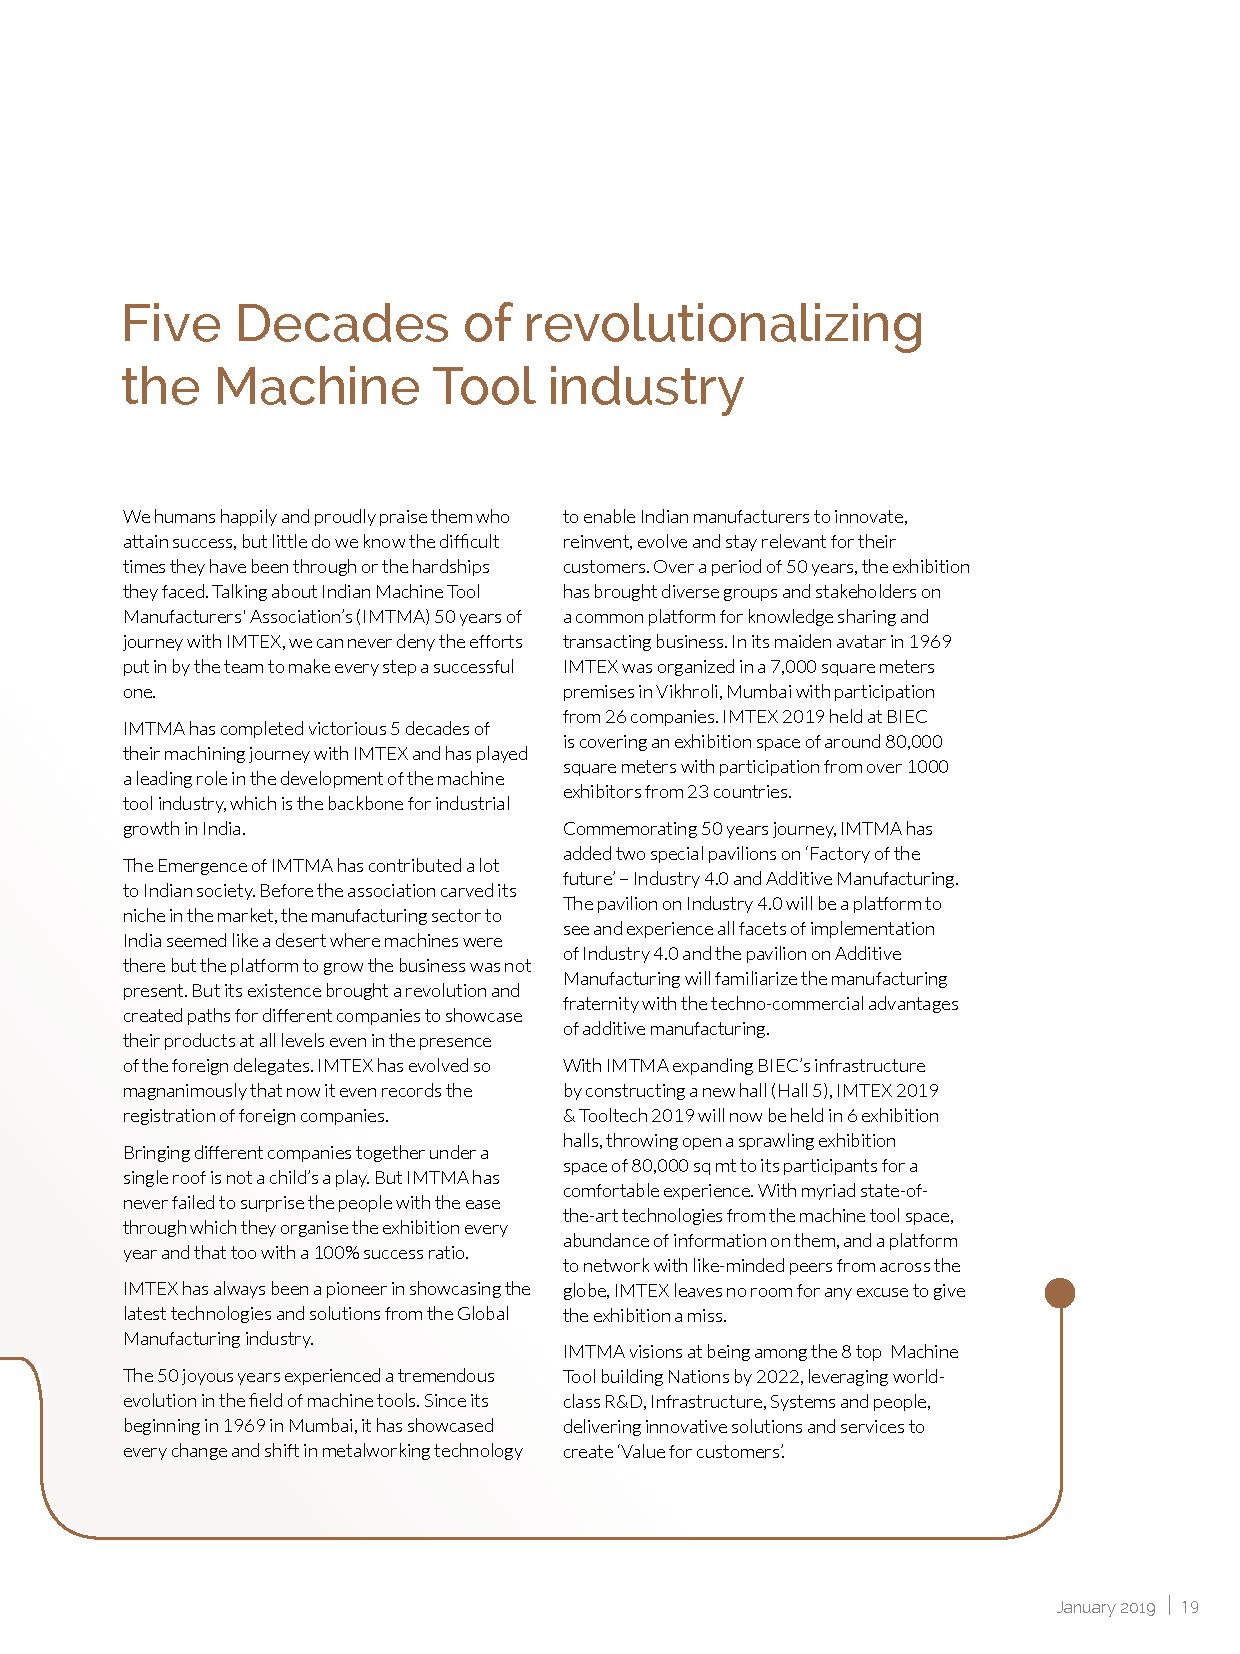 Machine Maker January 2019 Digital Edition